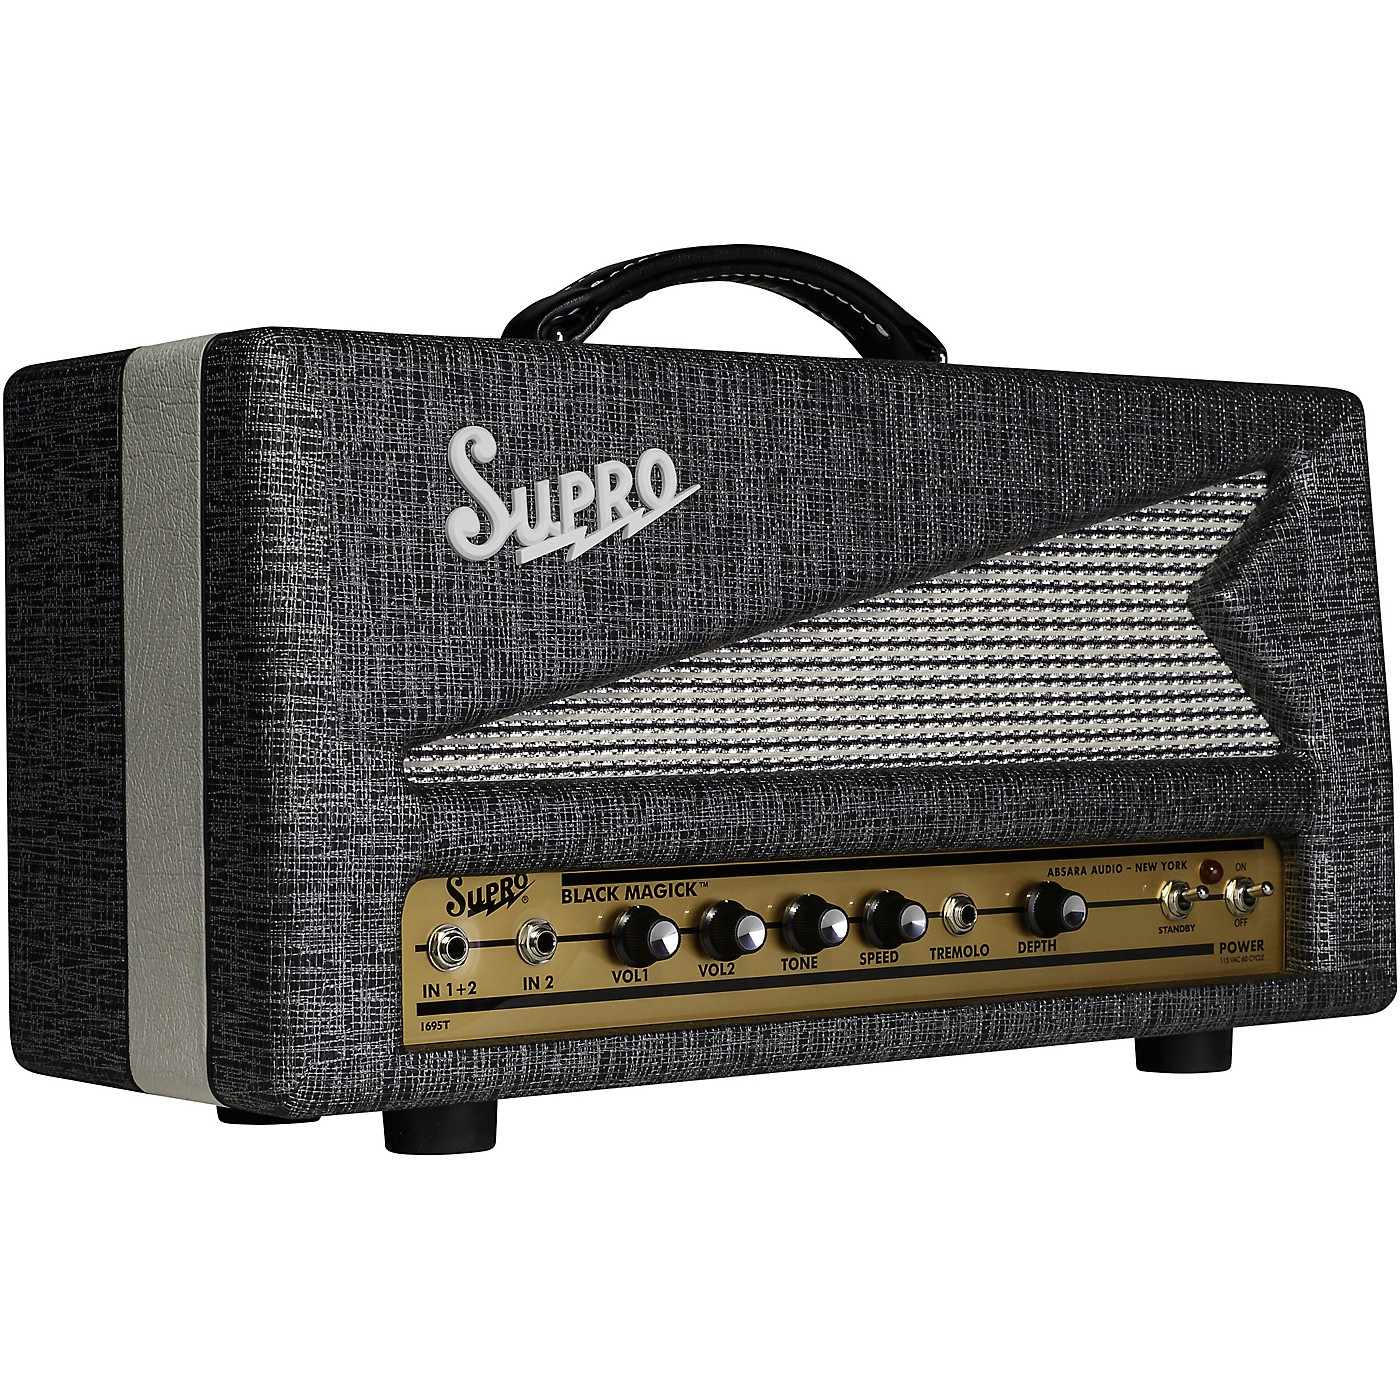 Supro Black Magick 25W Tube Guitar Amp Head thumbnail